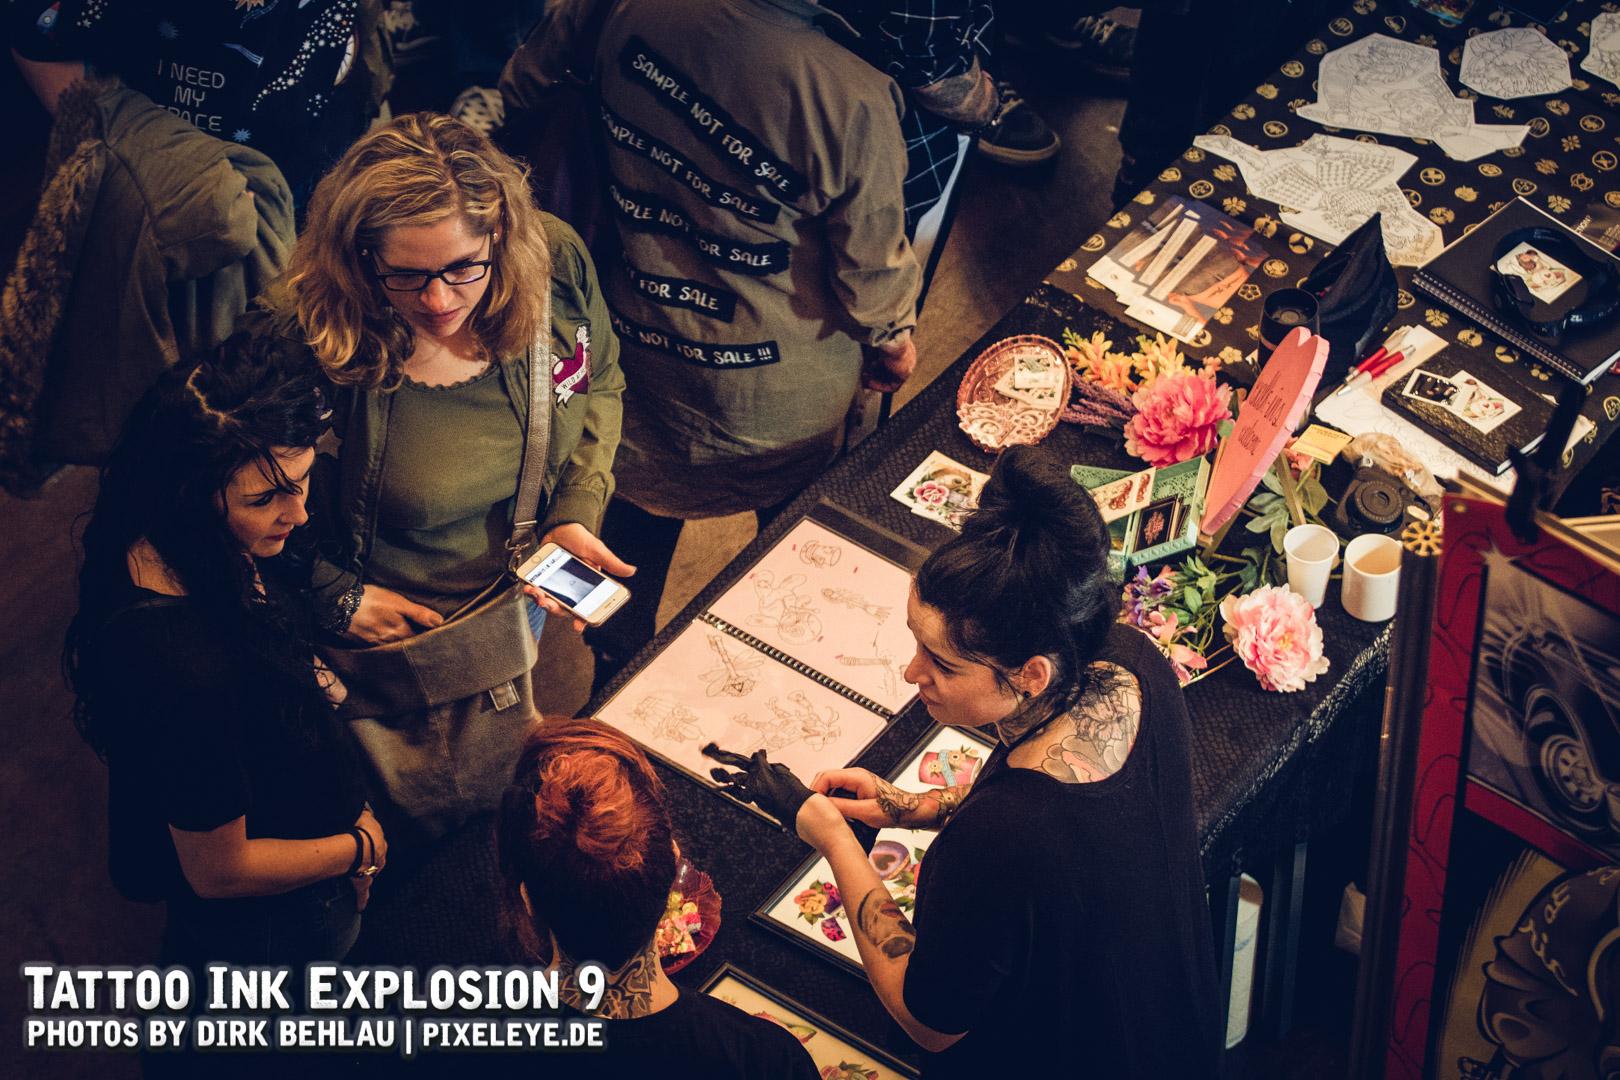 Tattoo Ink Explosion 2018 WEB by Dirk Behlau-1407.jpg